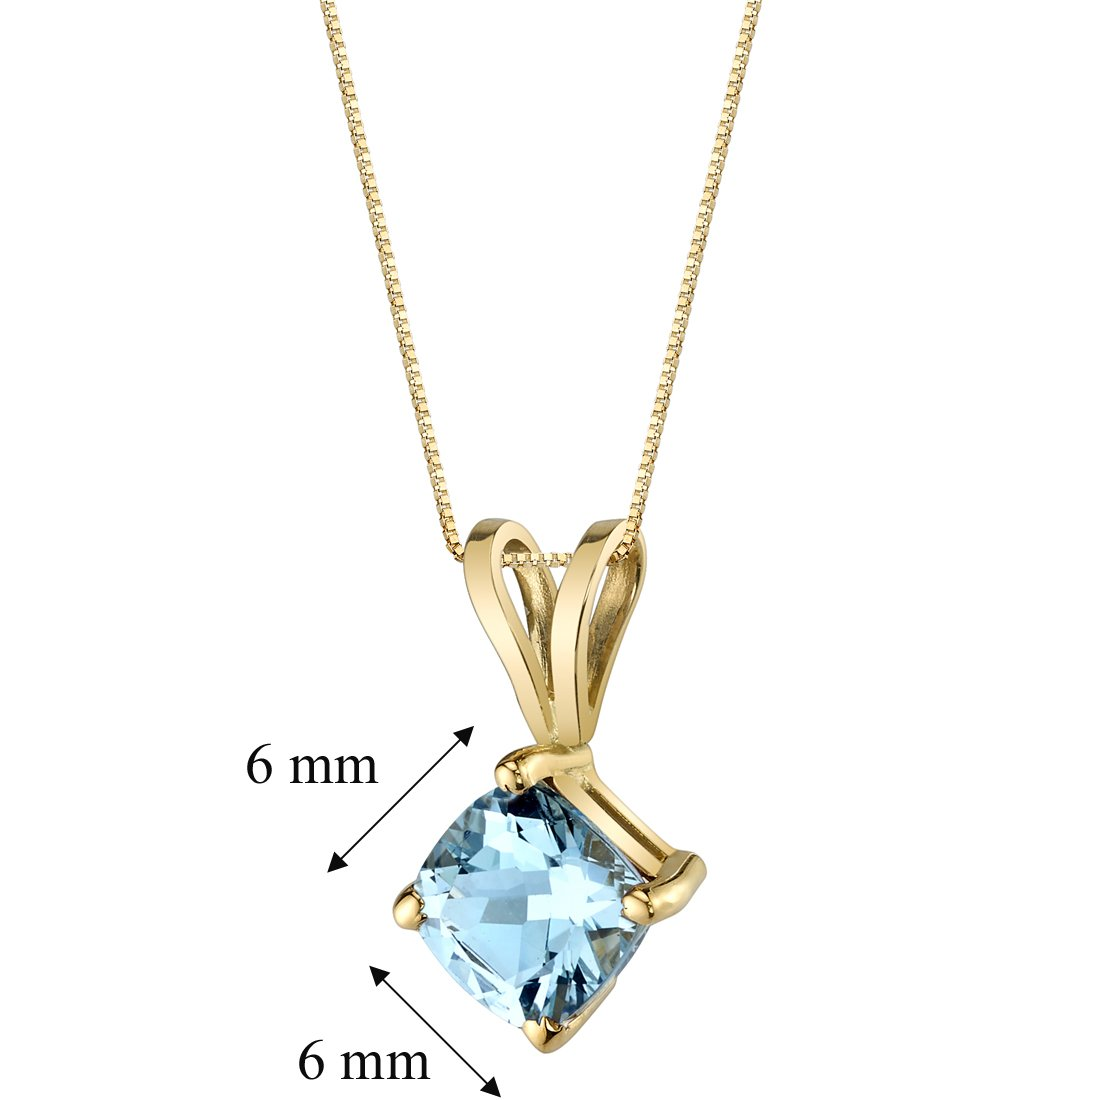 64911784d6a Amazon.com  14 Karat Yellow Gold Cushion Cut 0.75 Carats Aquamarine Pendant   Jewelry